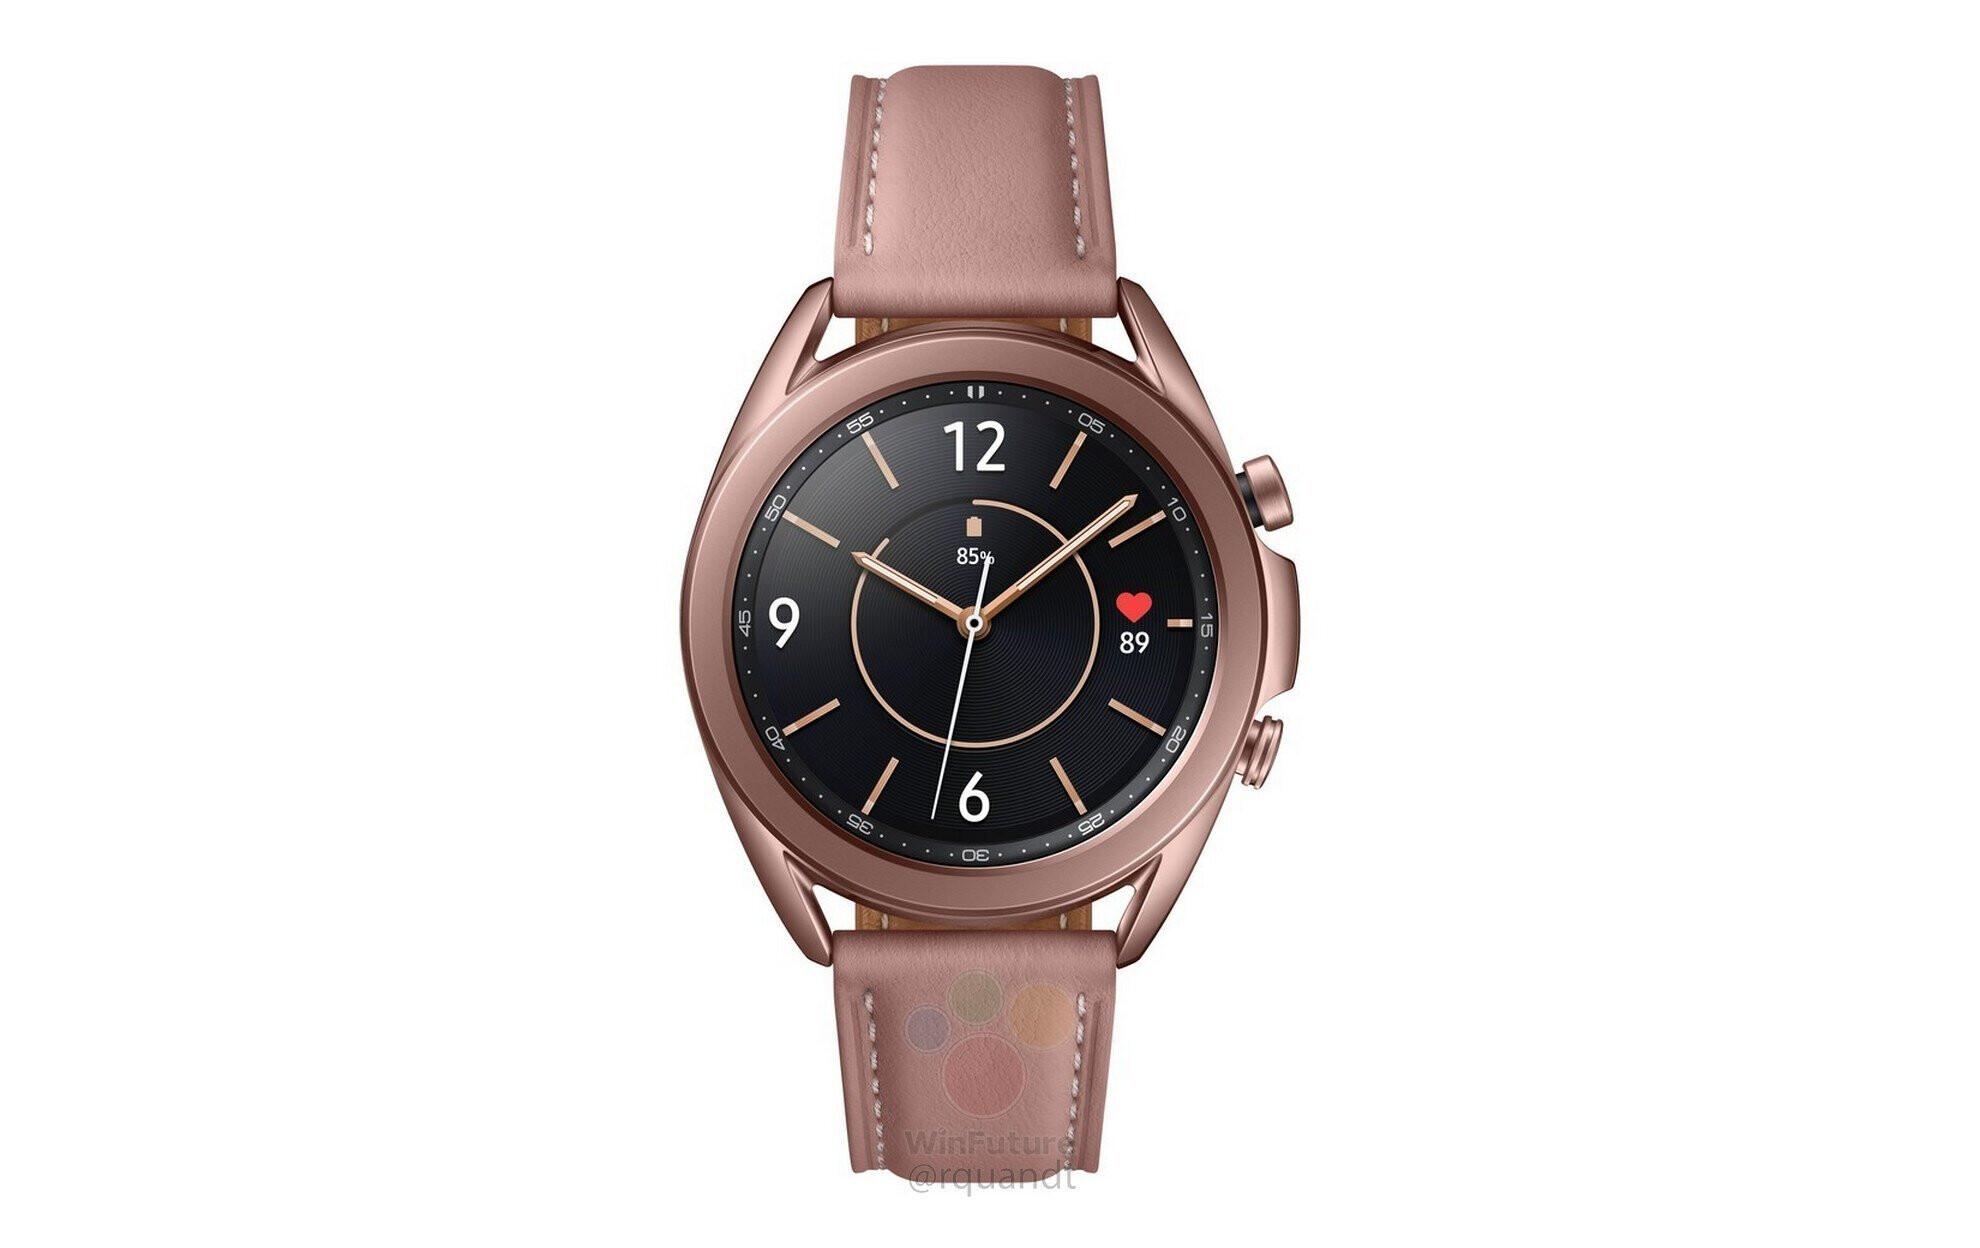 Samsung-Galaxy-Watch-3-41mm-1595863758-0-0.jpg